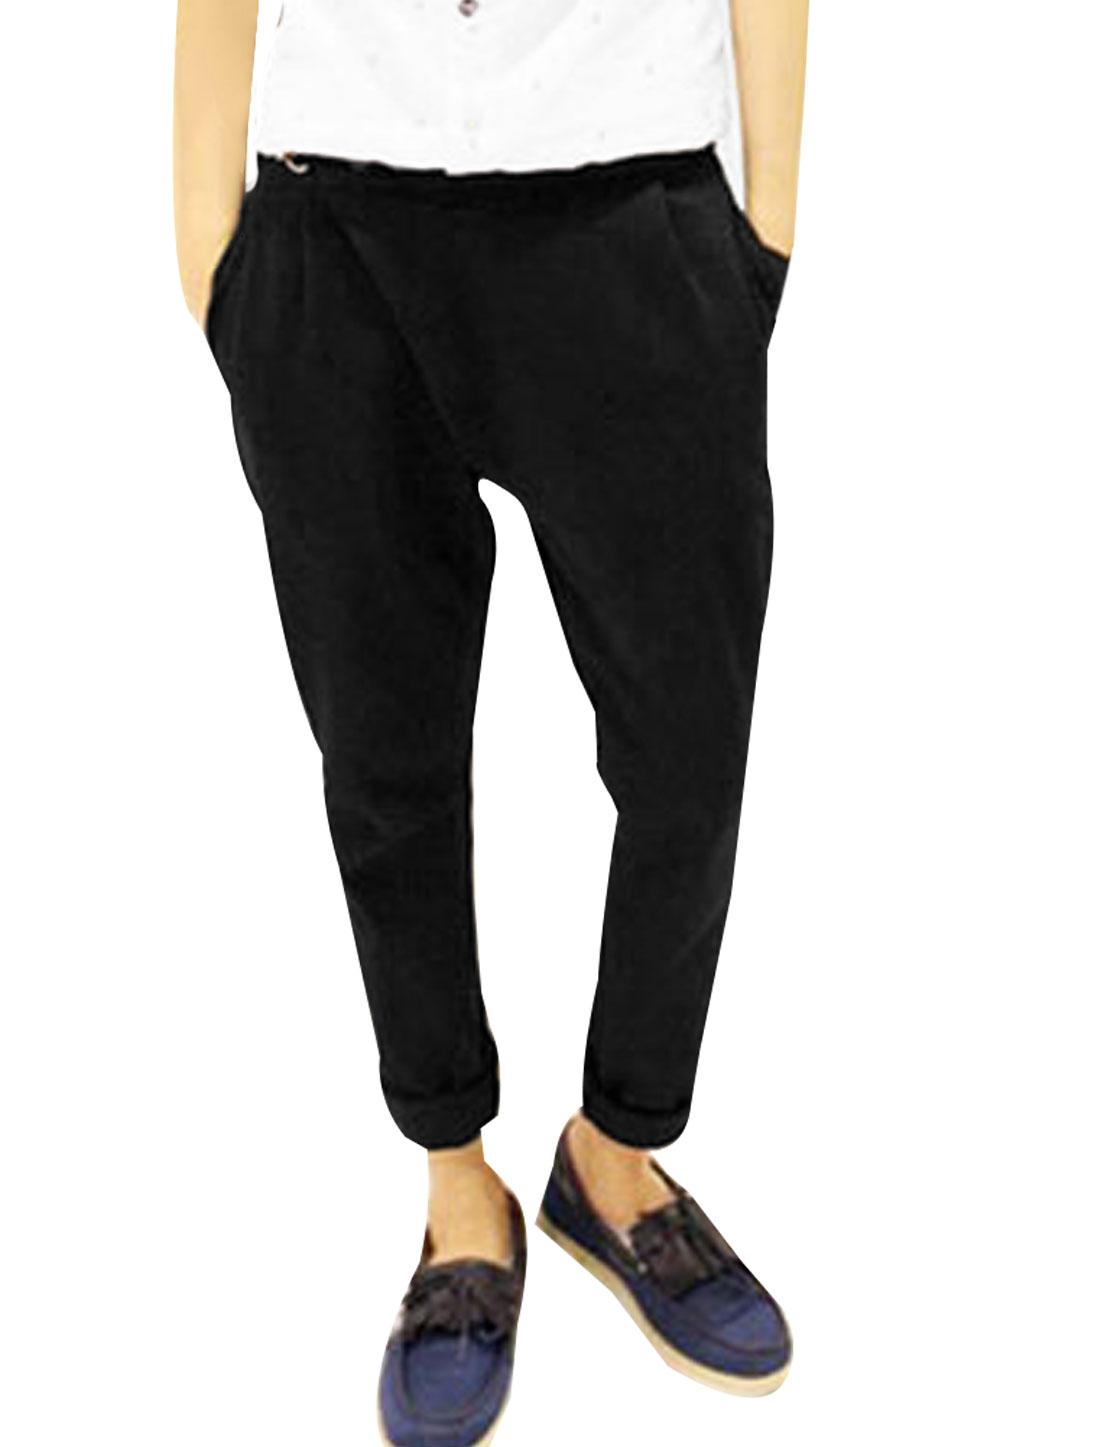 Men Black Elastic Waist Zip Fly Front Pockets Harem Trousers W30